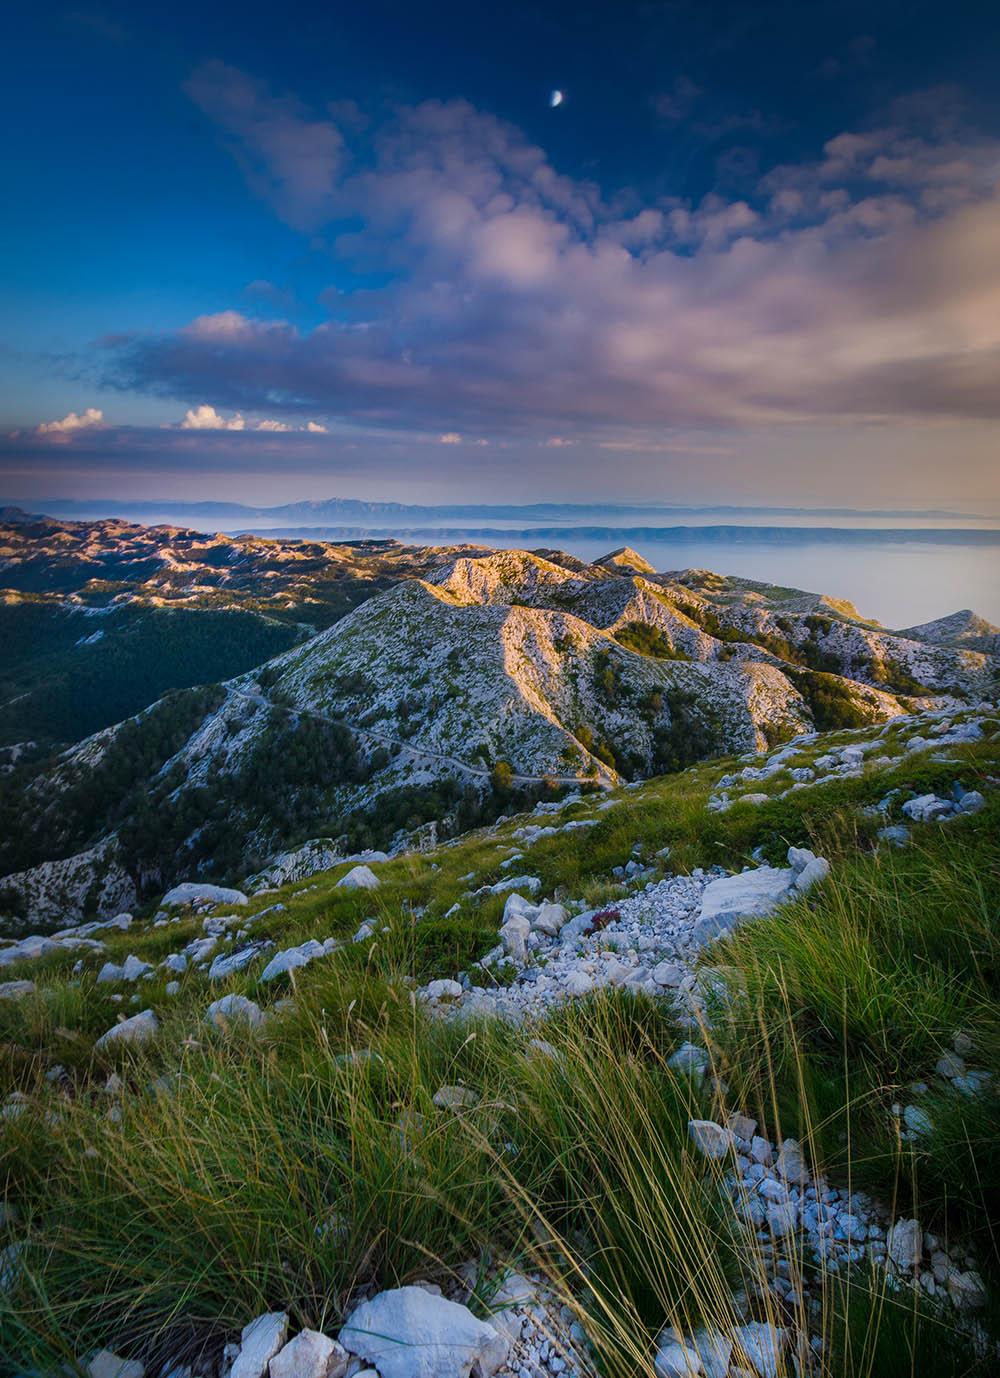 153.1. Mag Robert. Linistea de la munte (Biokovo National Park,  Croatia)